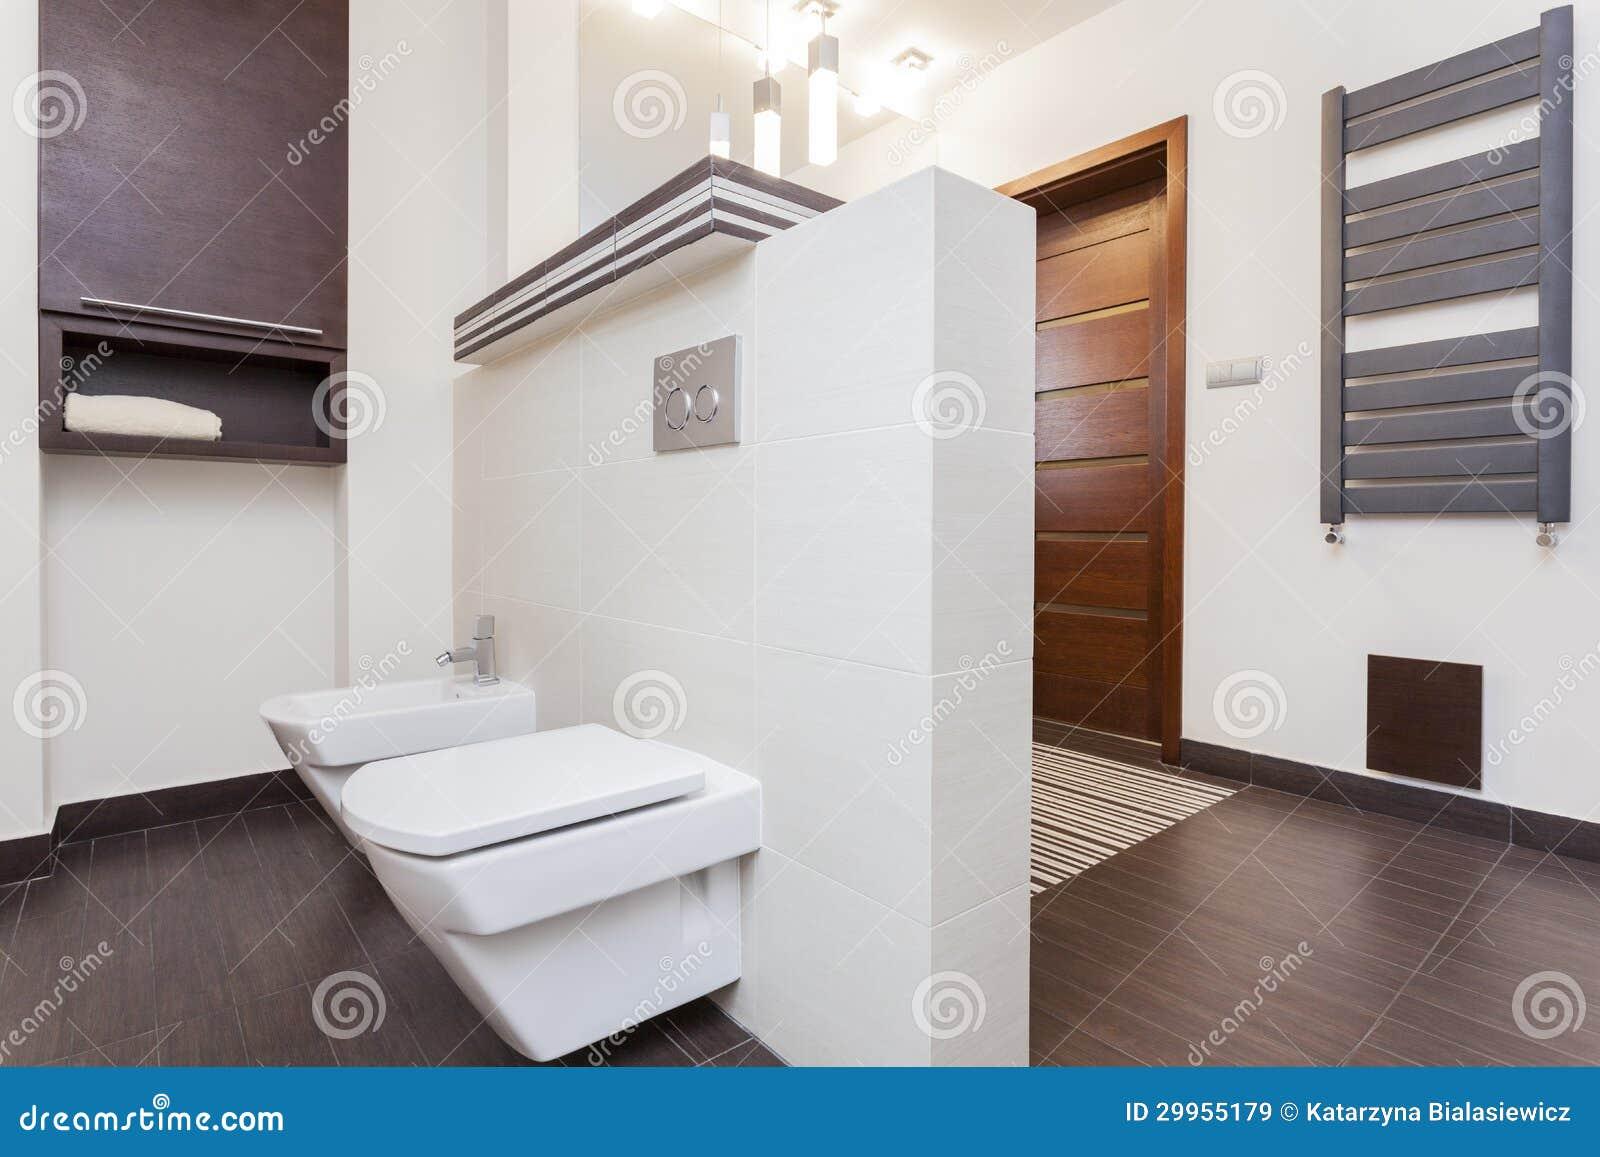 Grand Design - Small Bathroom Stock Image - Image of door, light ...